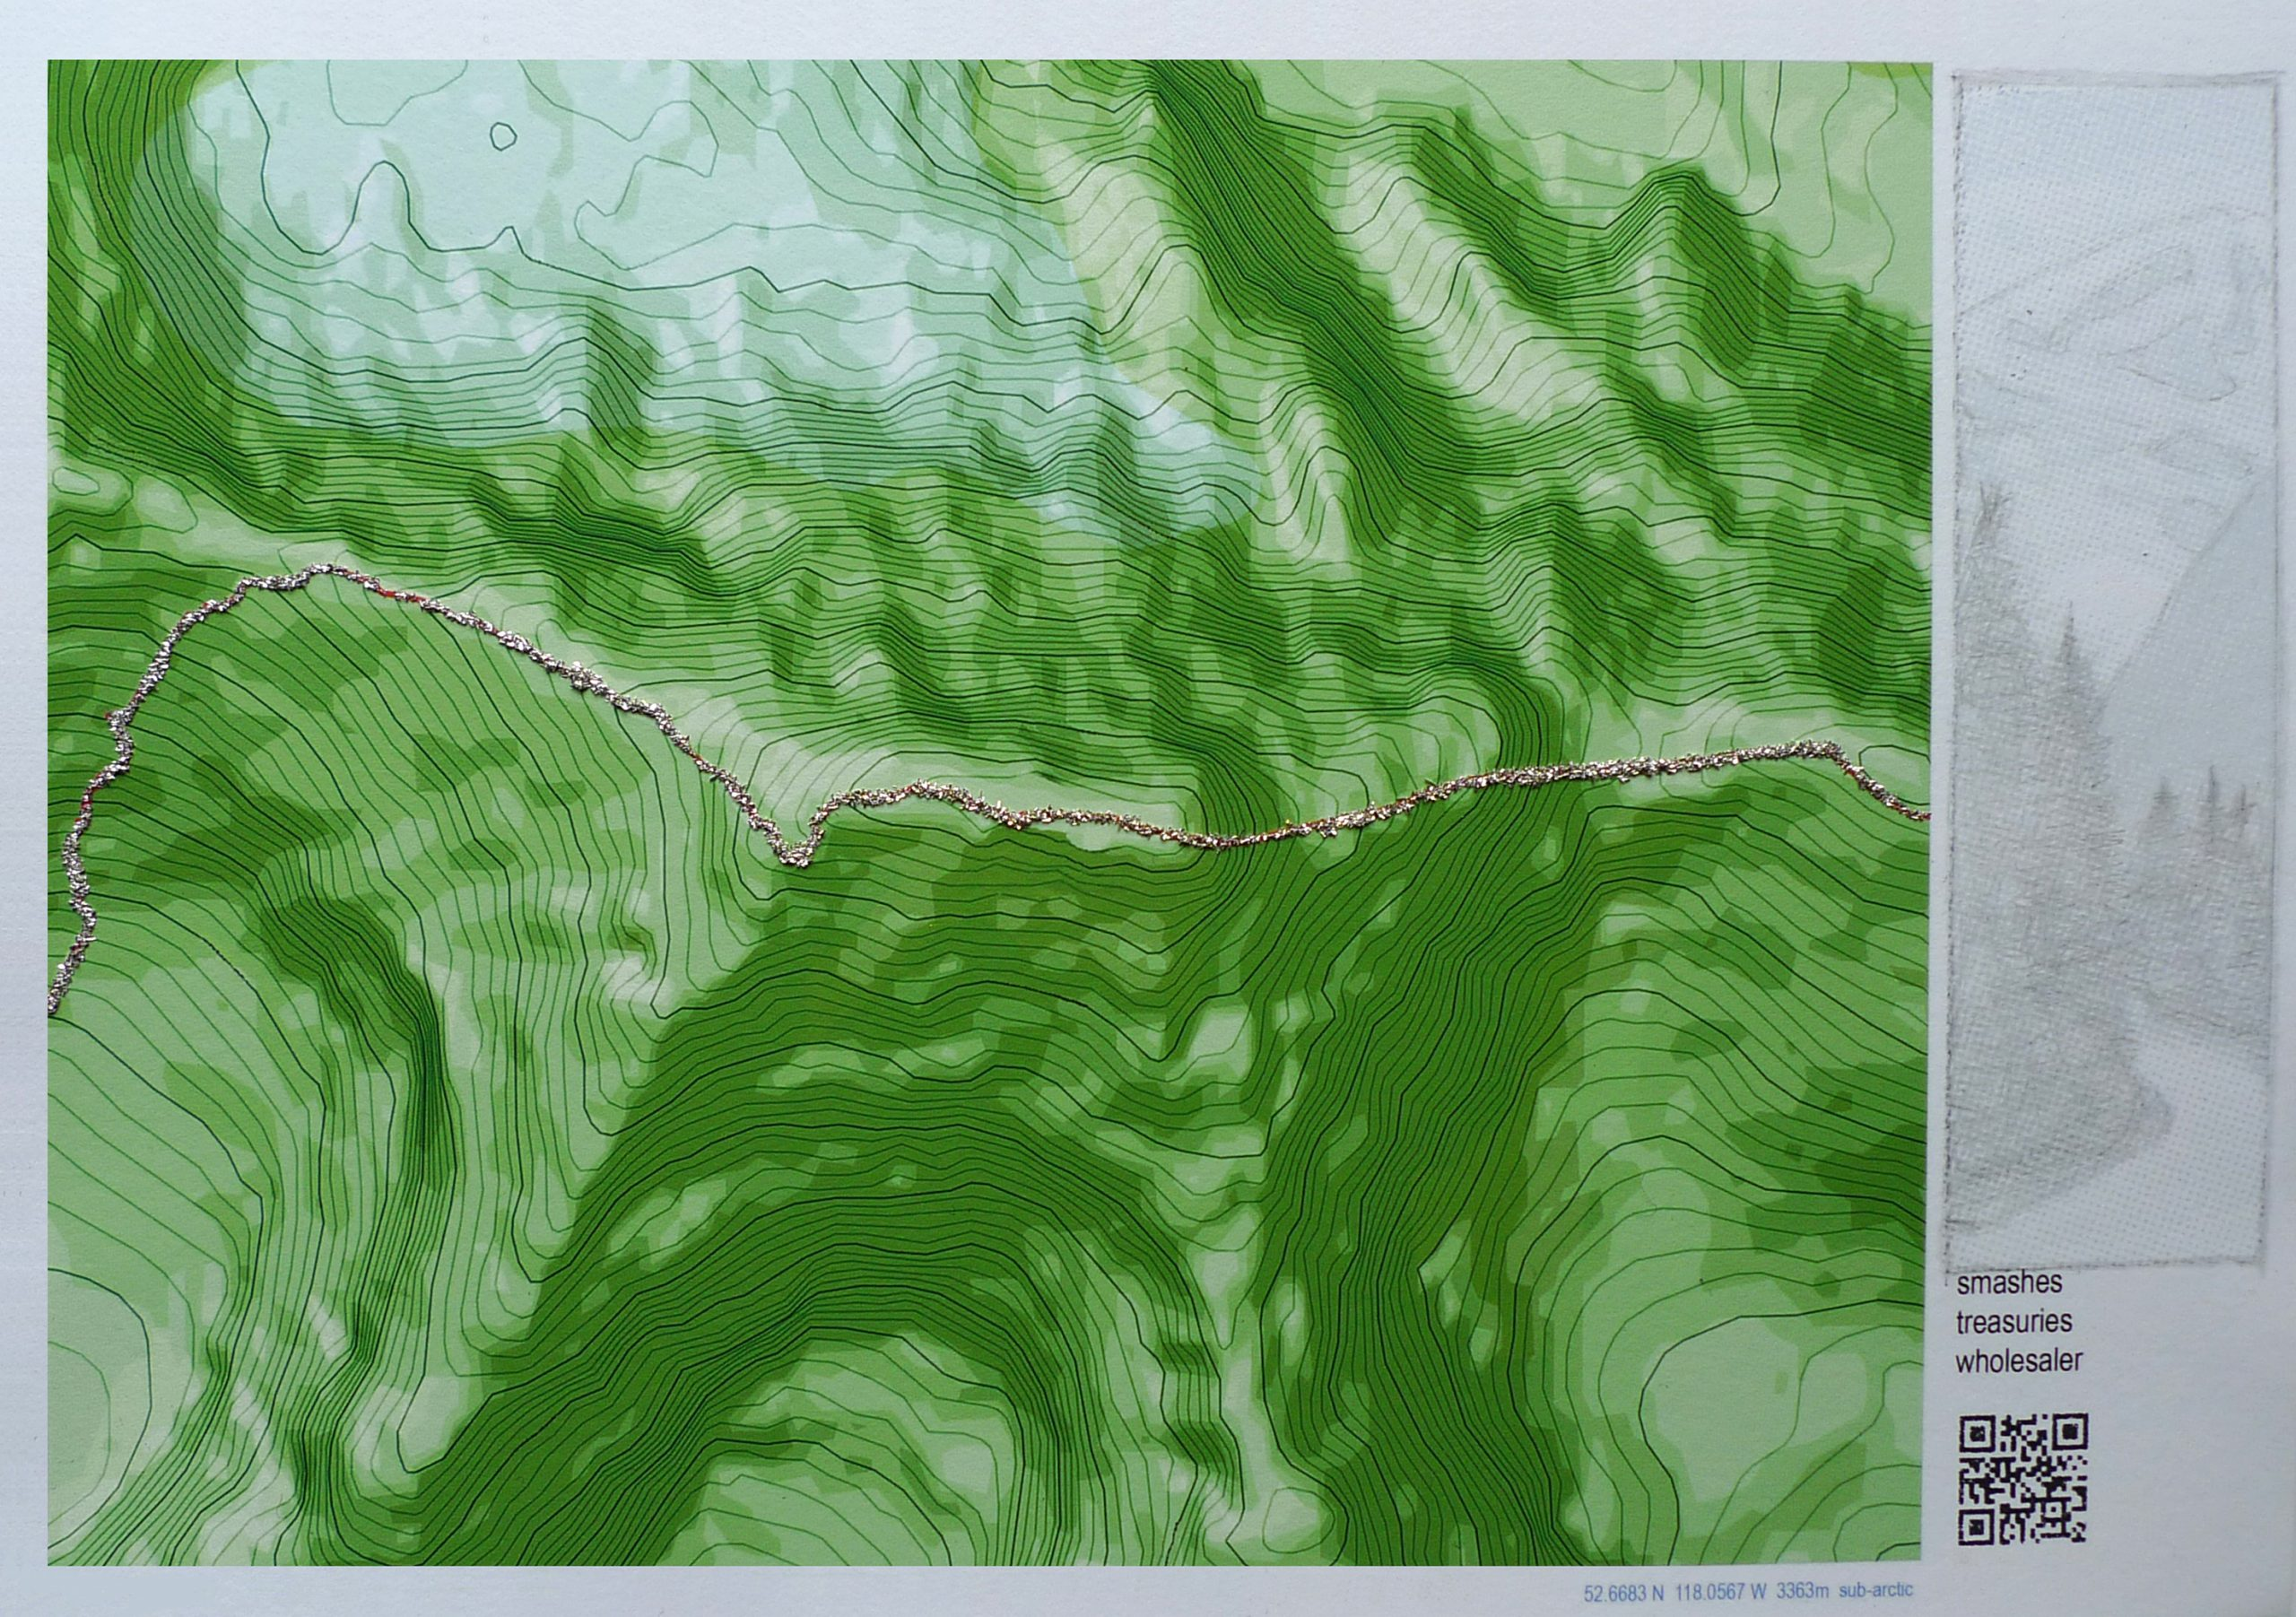 (3) Paula McLoughlin - The Road to Edith Image